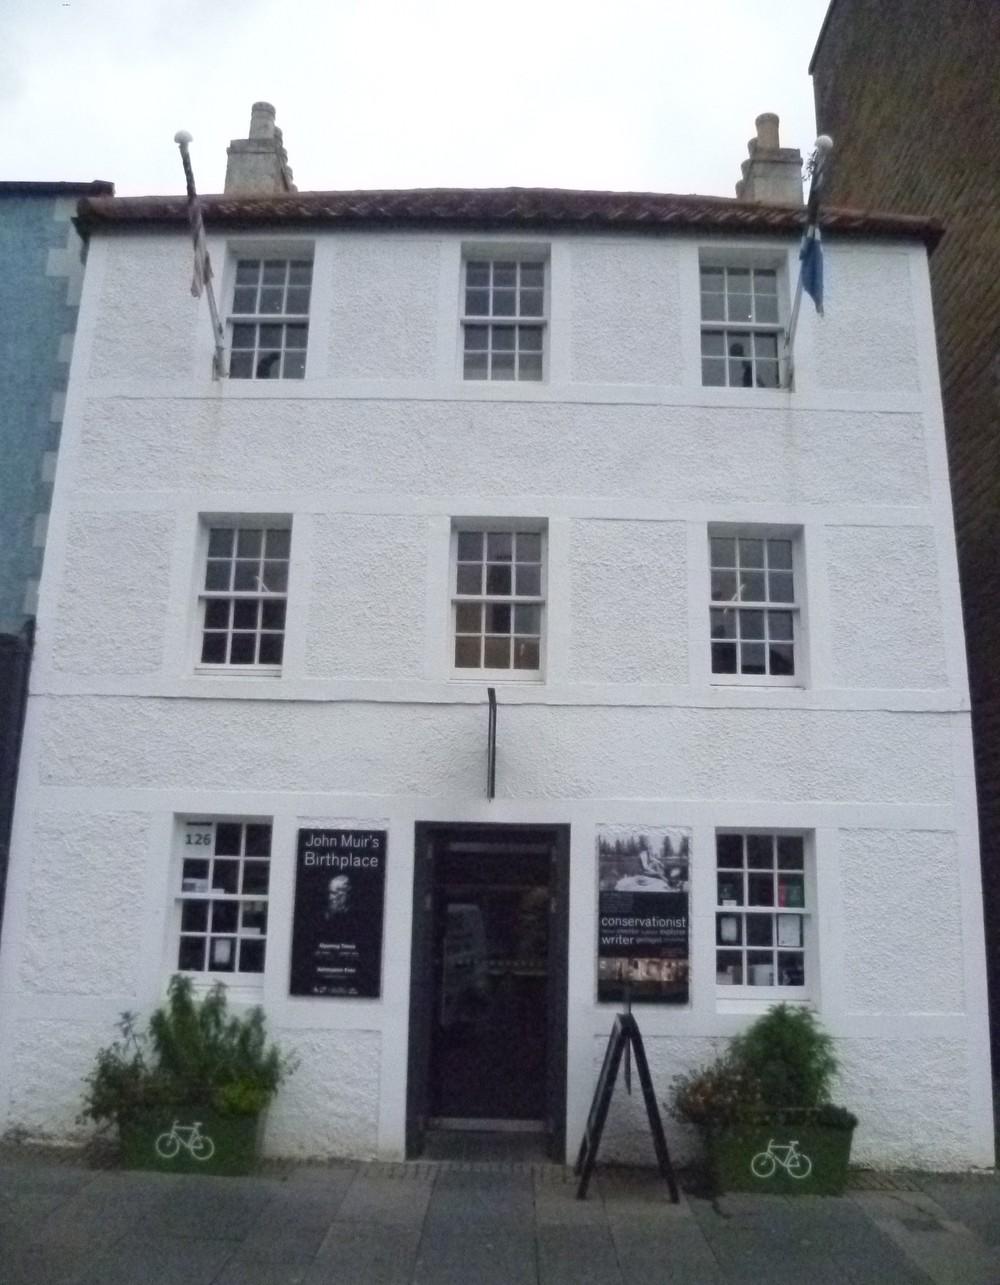 John Muirs Birthplace Dunbar